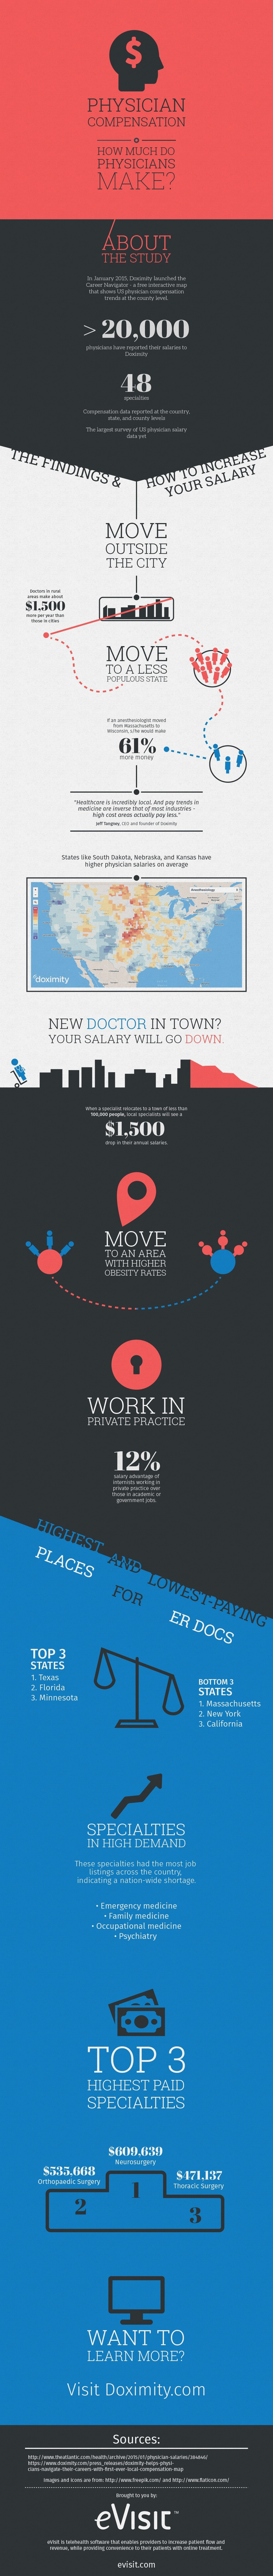 Physician-salary-infographic_v5 (1)-min (1)